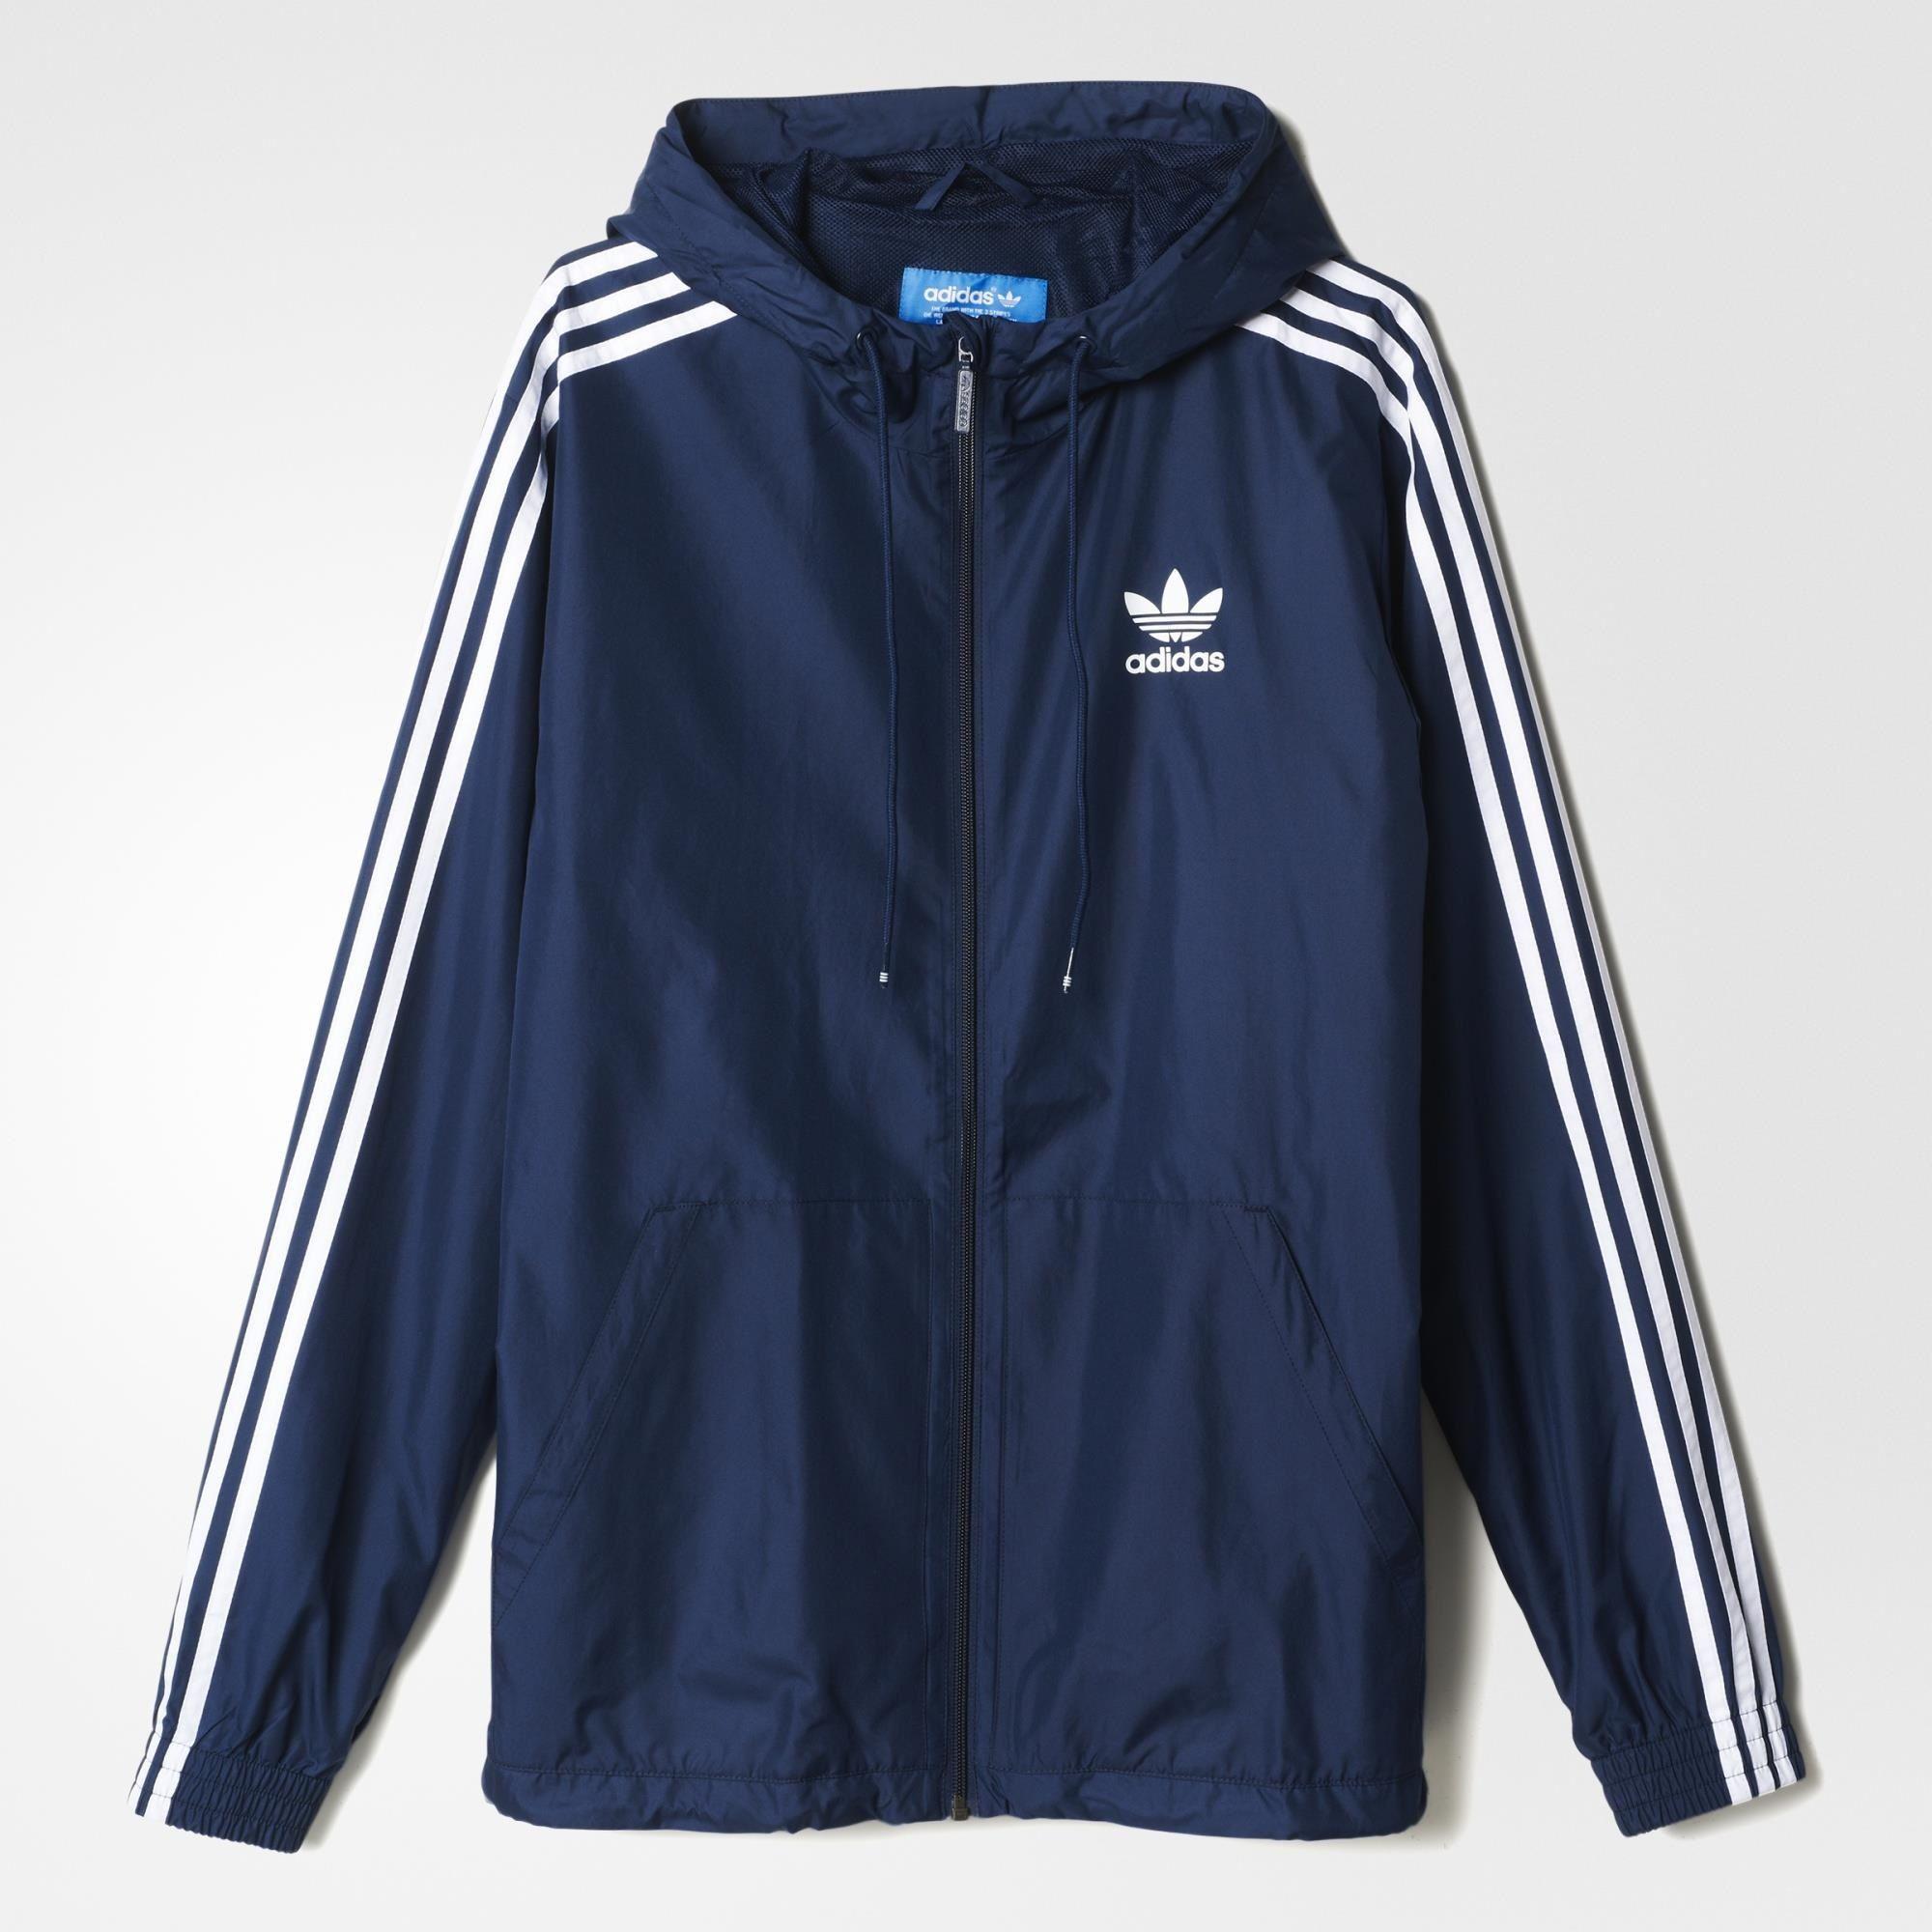 Adidas Itasca Windbreaker Blue Adidas Uk Hoody Outfits Adidas Jacket Outfit Adidas Outfit